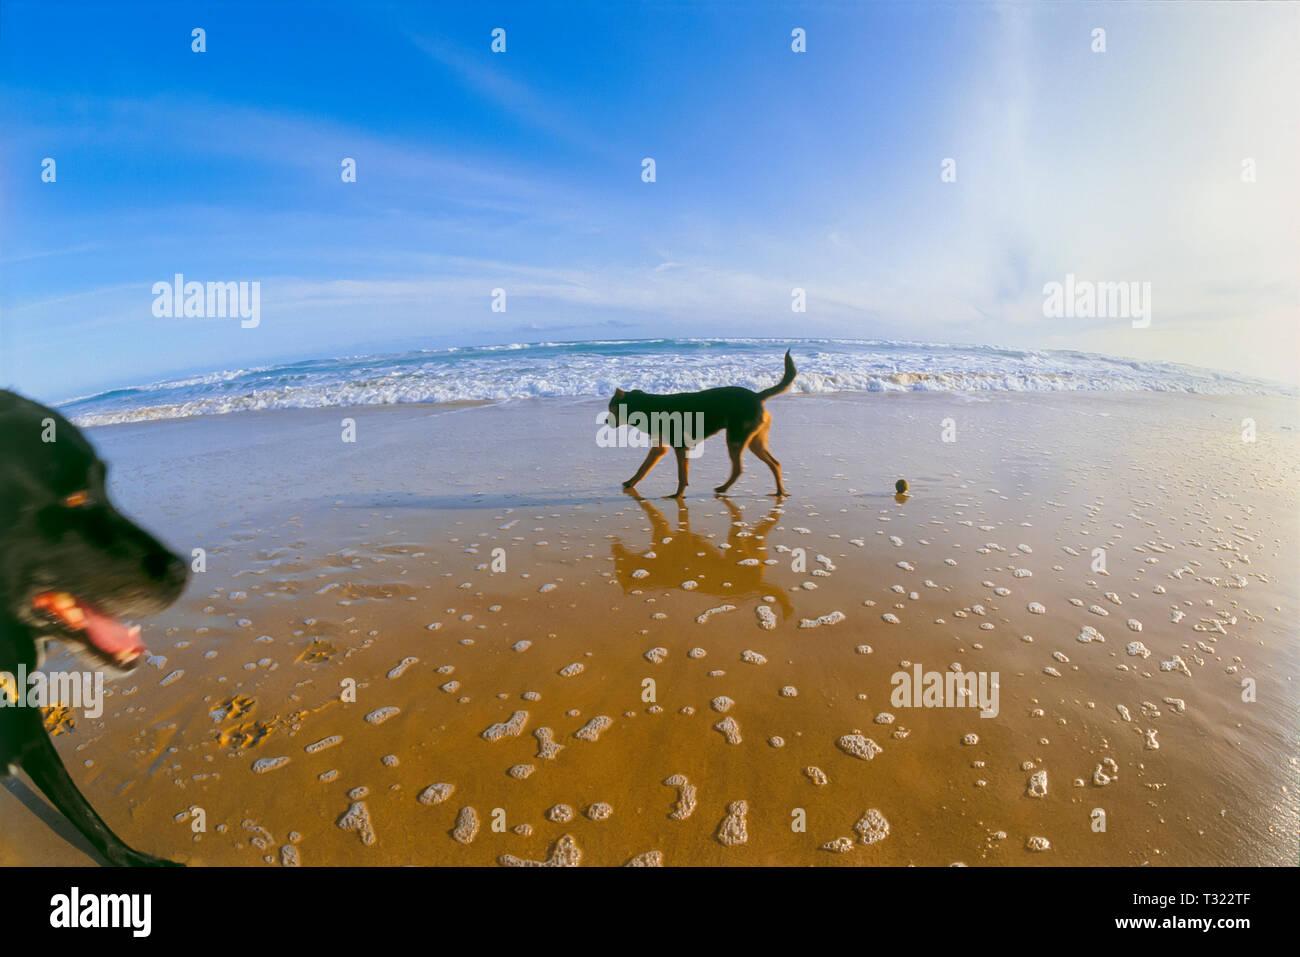 Dogs playing on beach, fisheye distortion - Stock Image